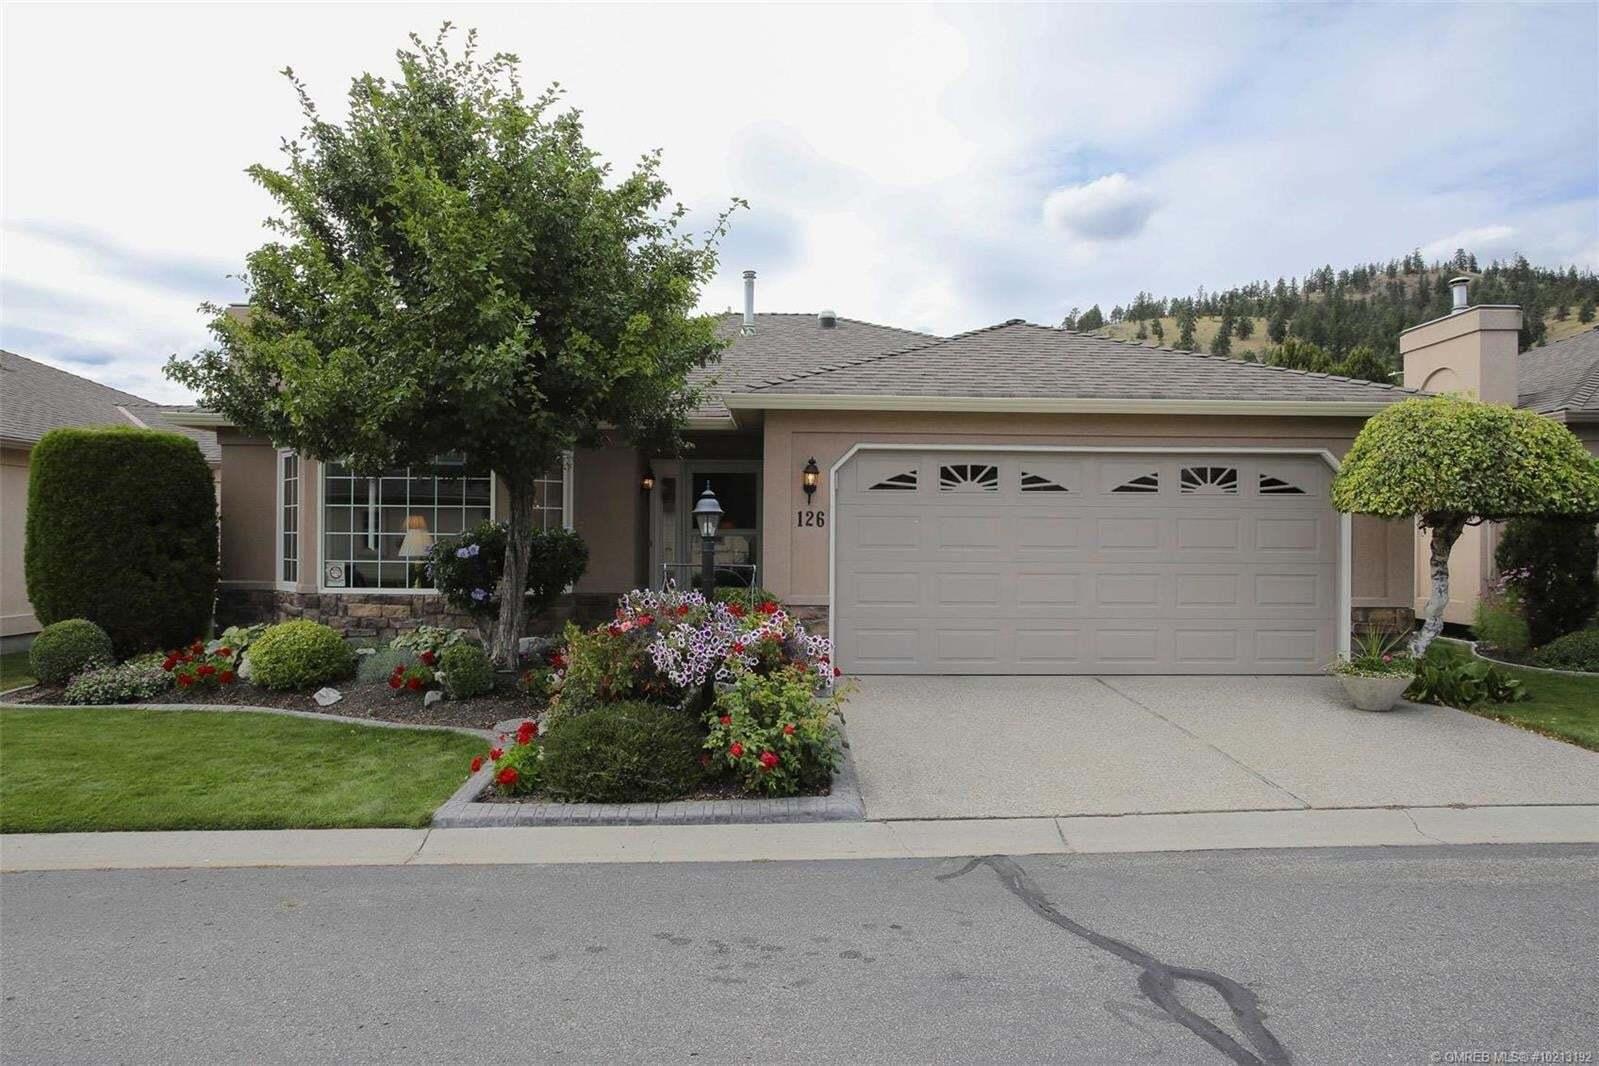 Townhouse for sale at 595 Yates Rd Kelowna British Columbia - MLS: 10213192